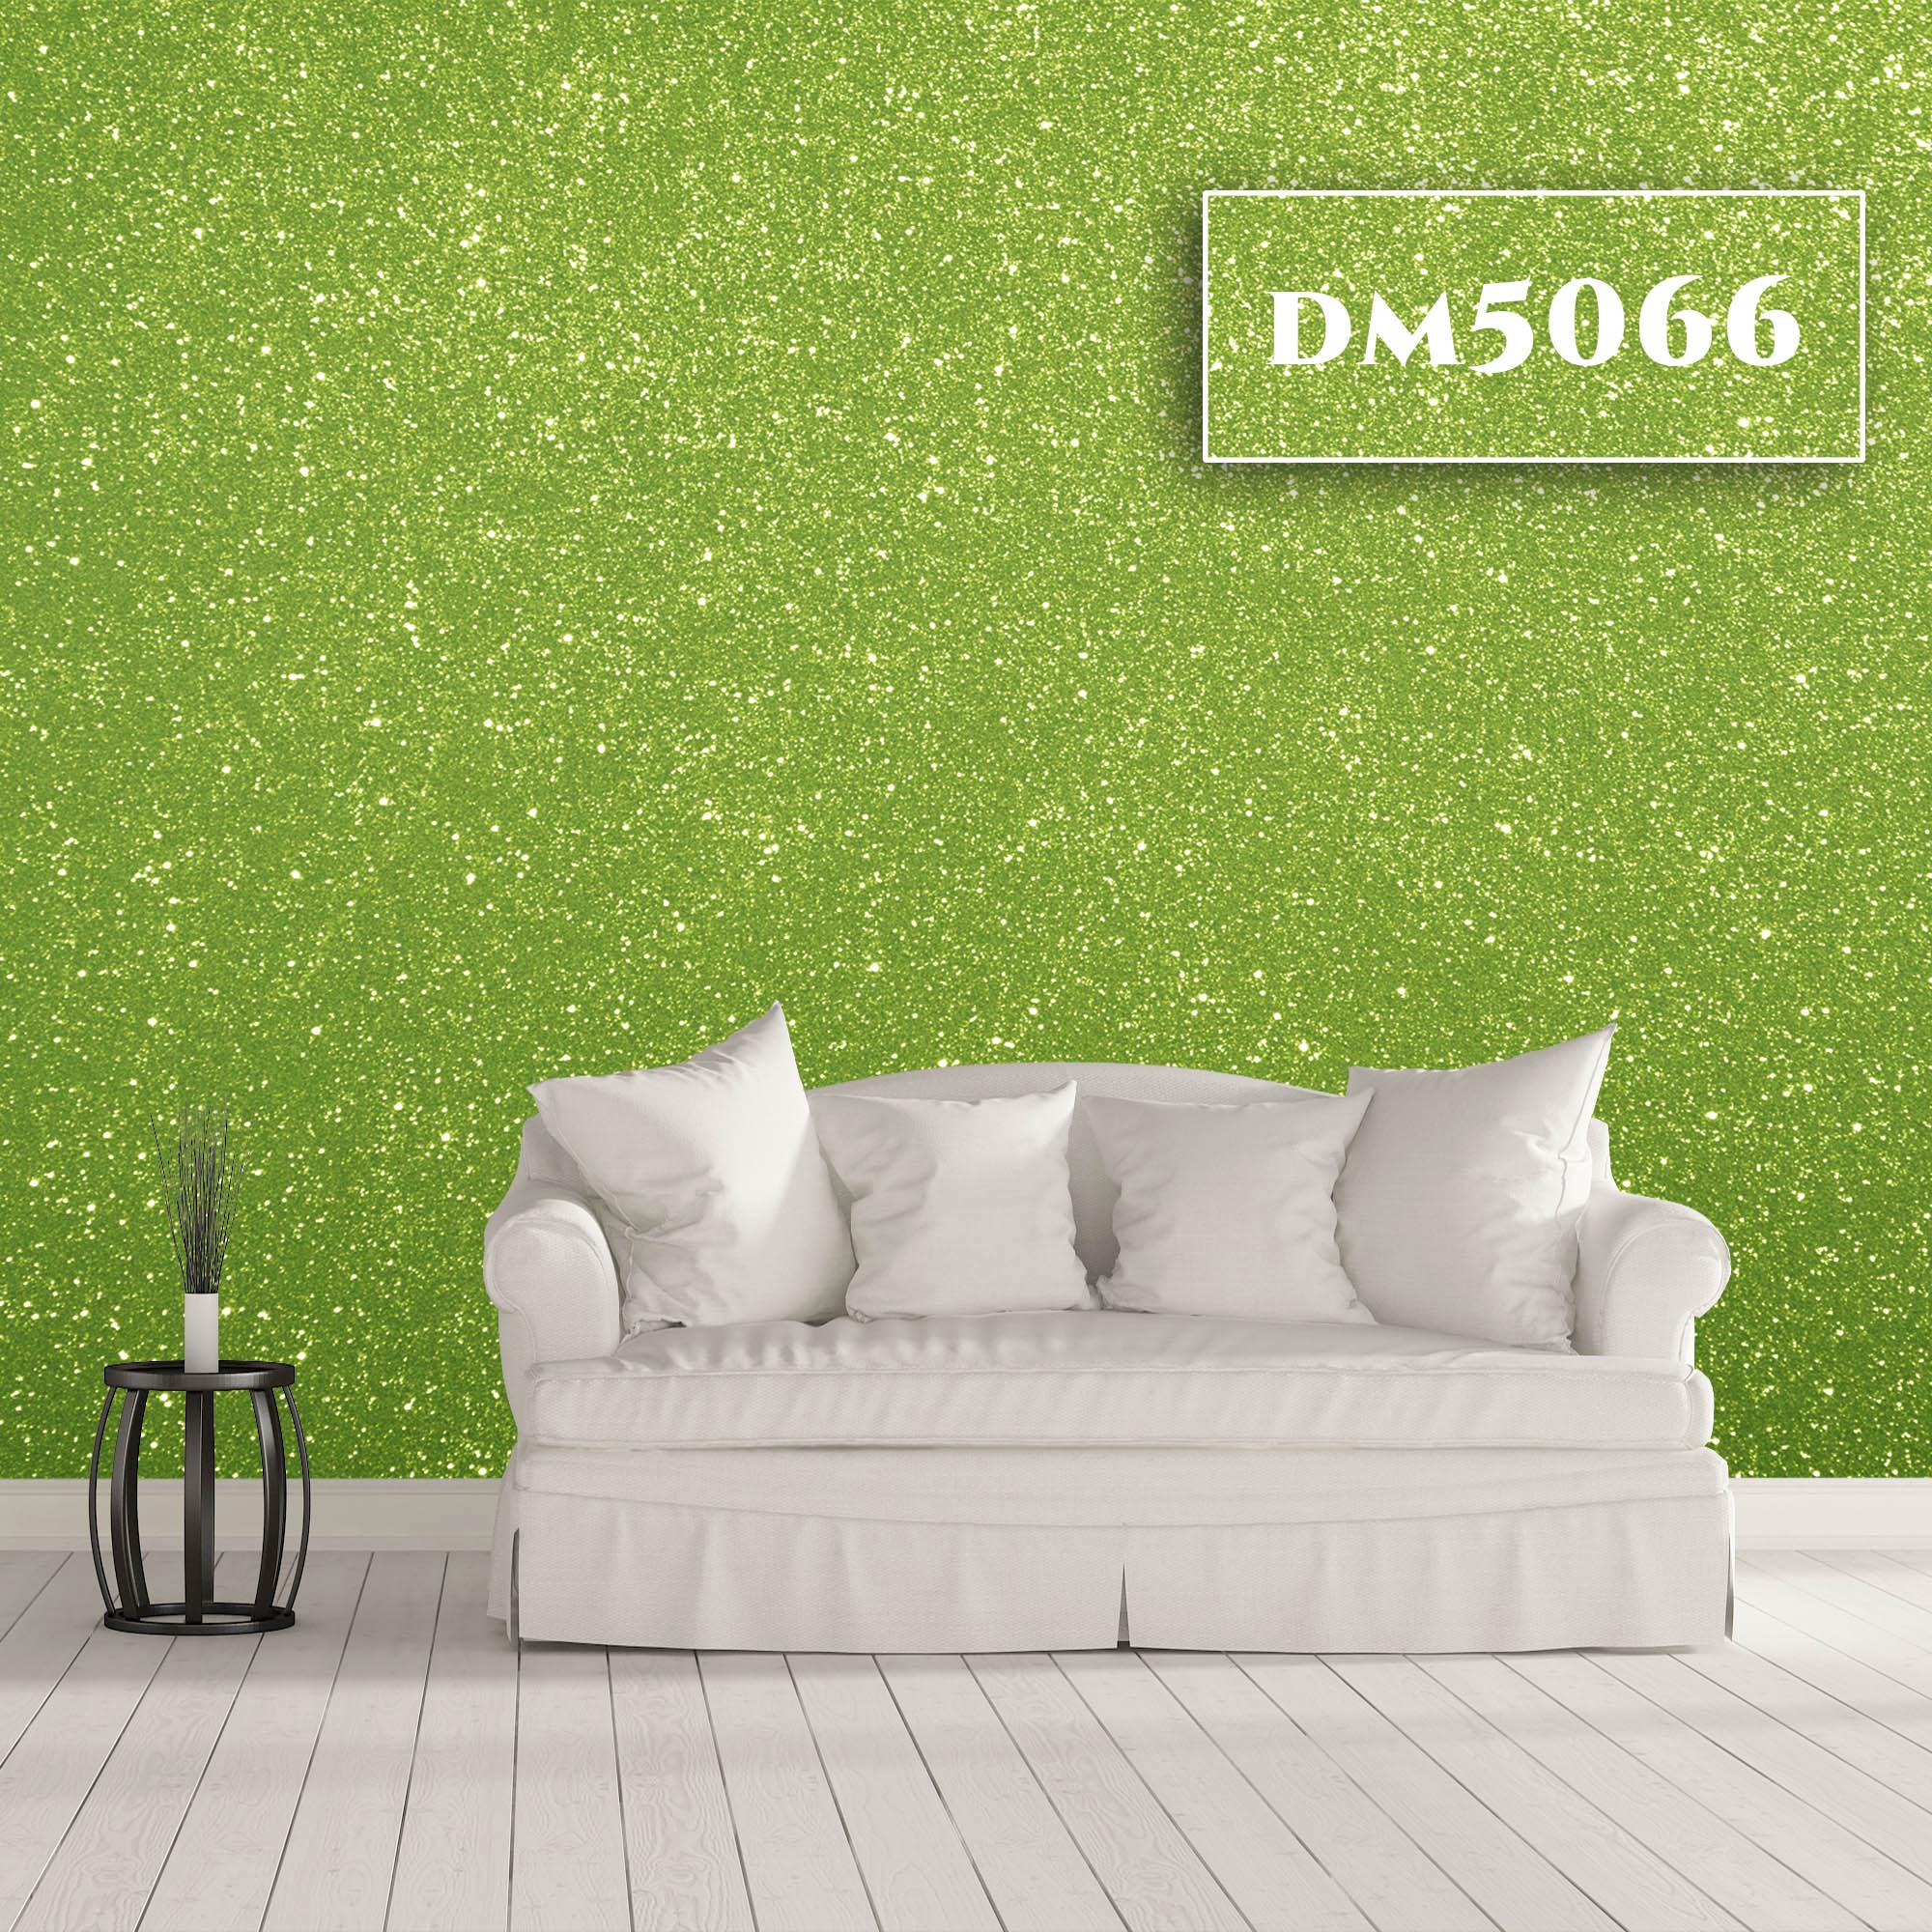 DM5066